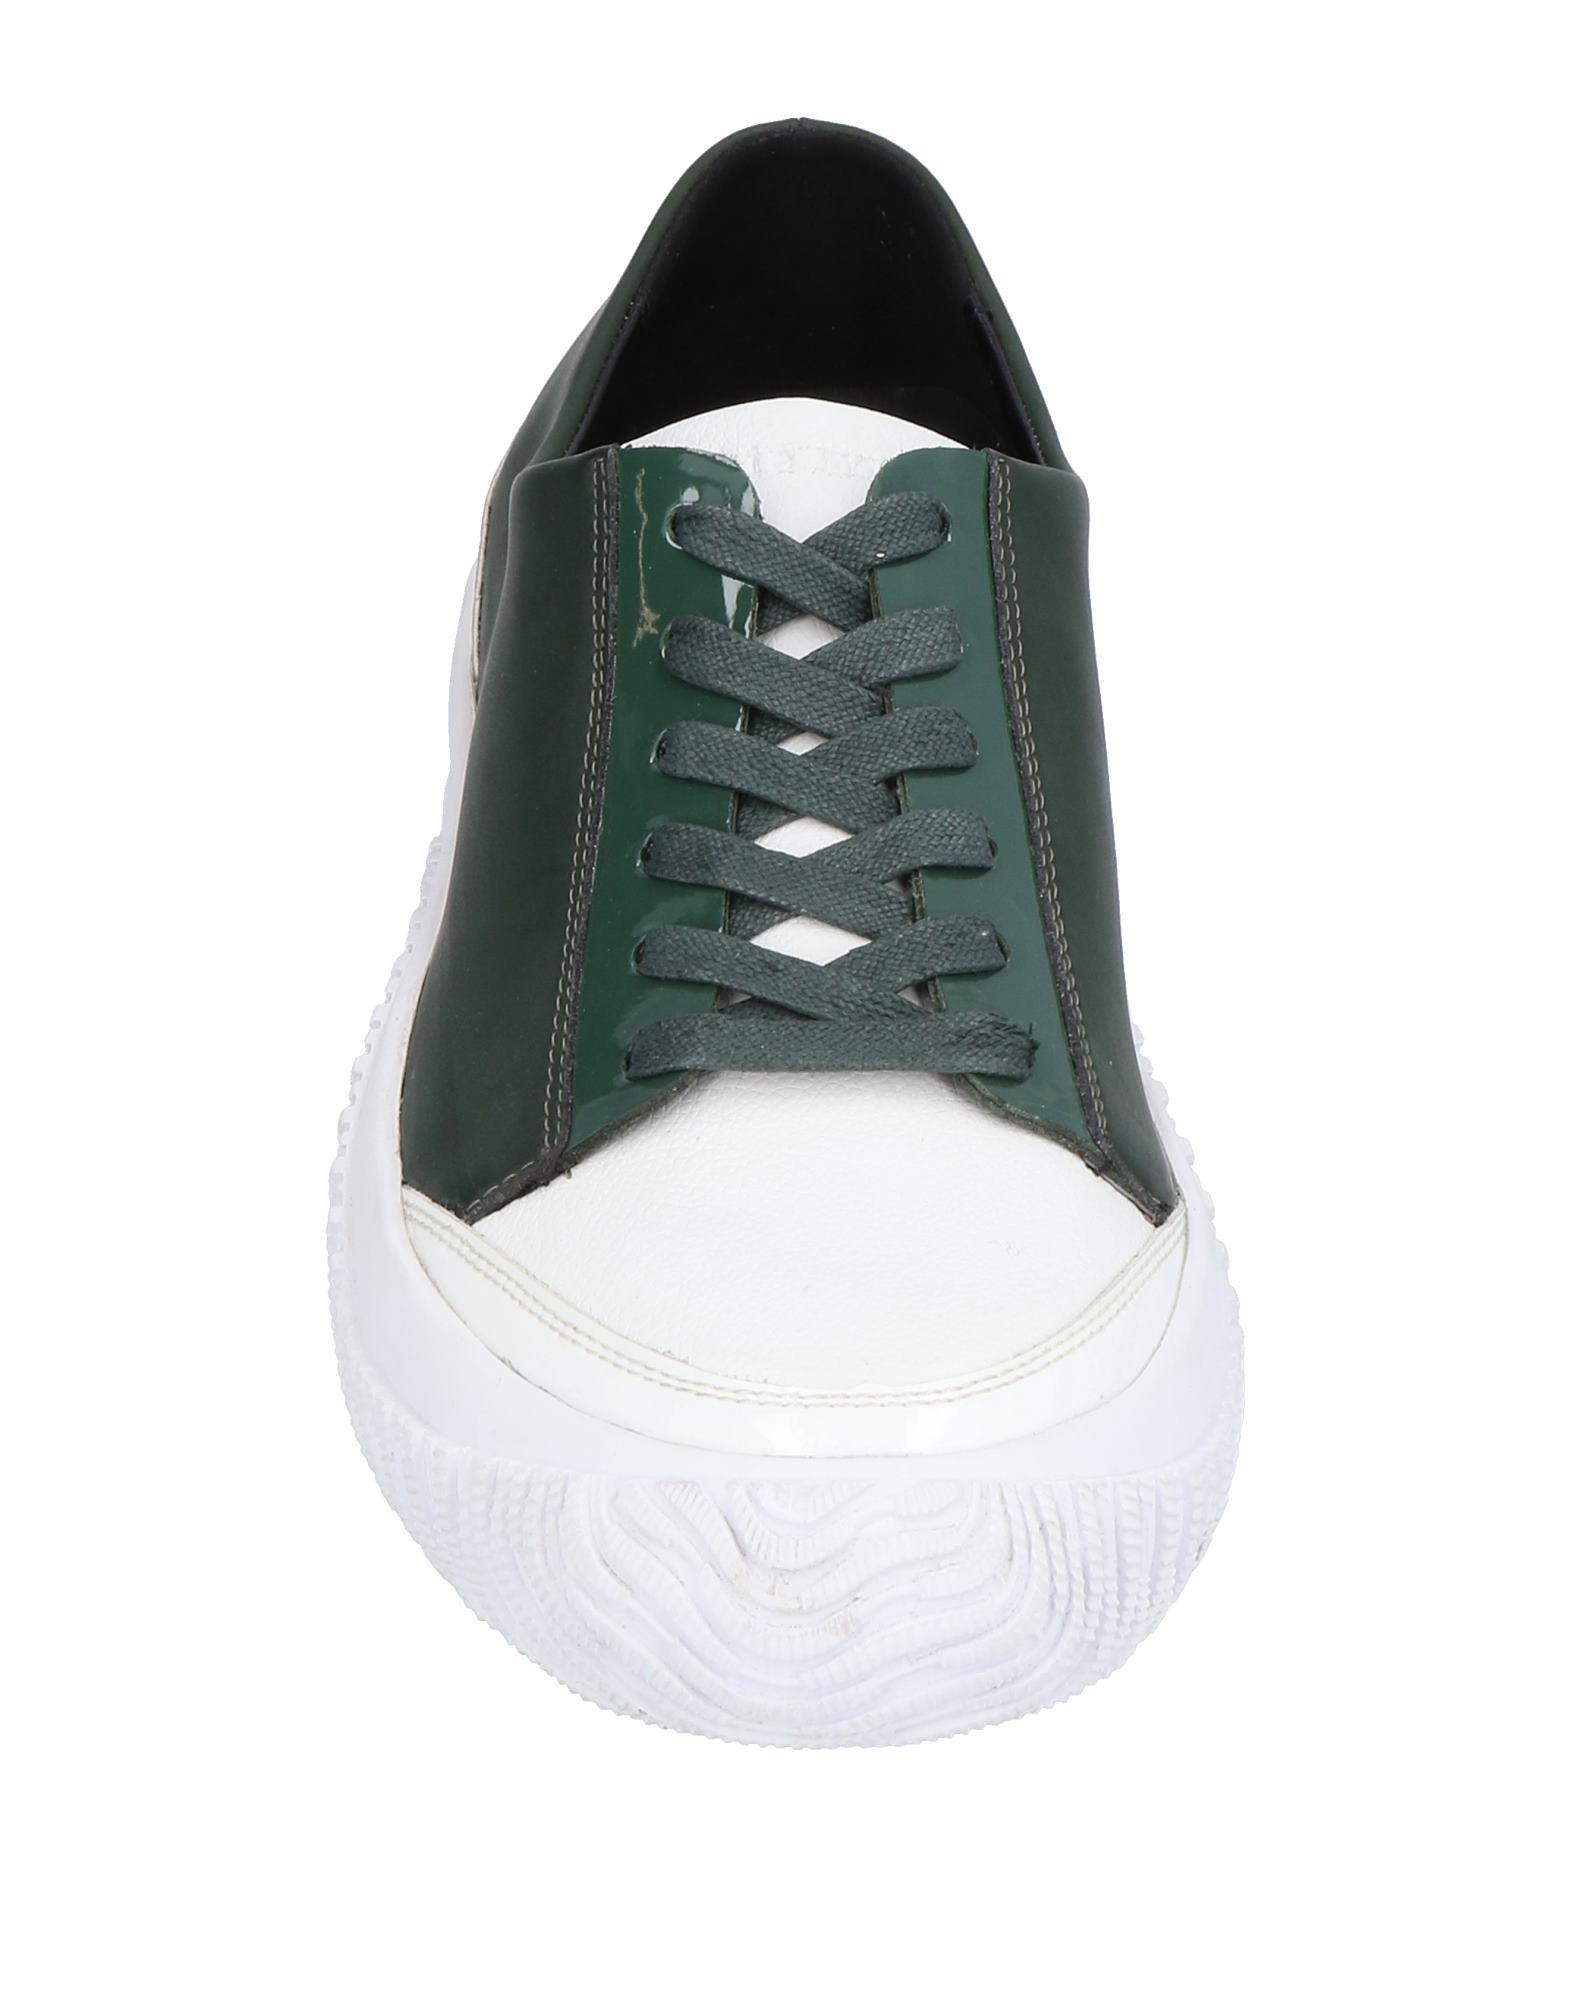 Rabatt echte Schuhe Frankie  Morello Sneakers Herren  Frankie 11463491JP b62b63